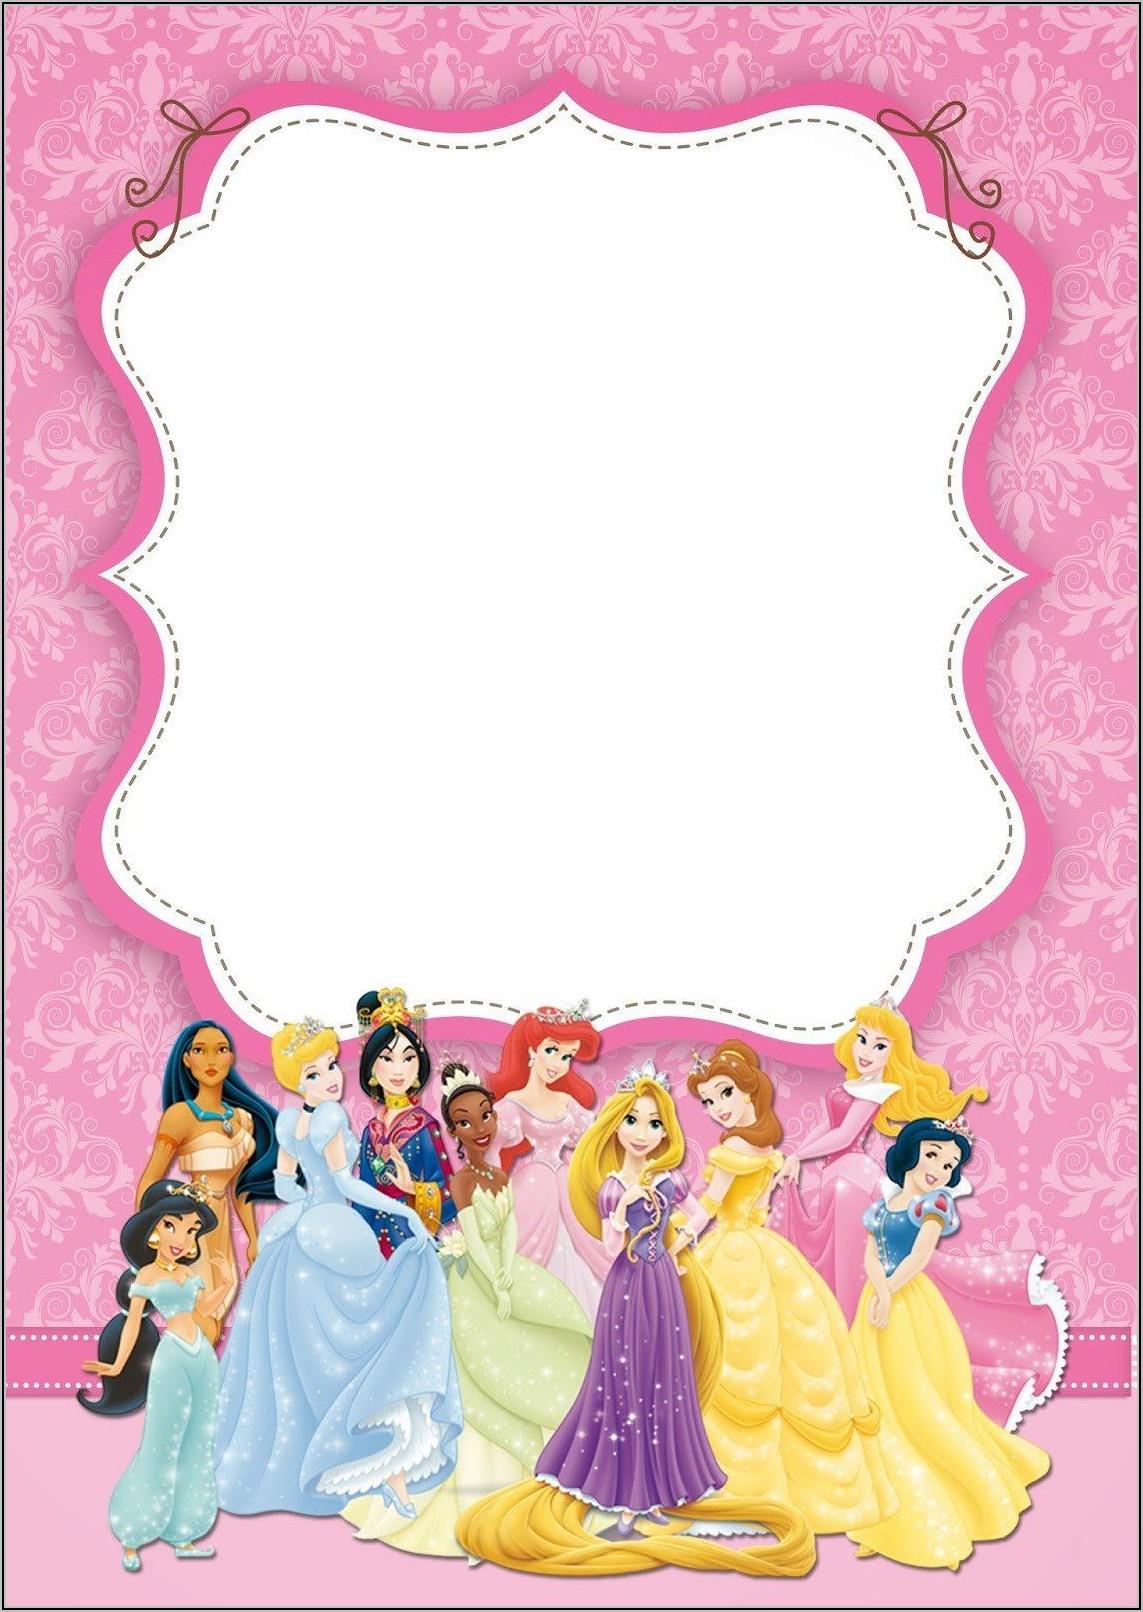 Disney Princess Party Invitation Template Free